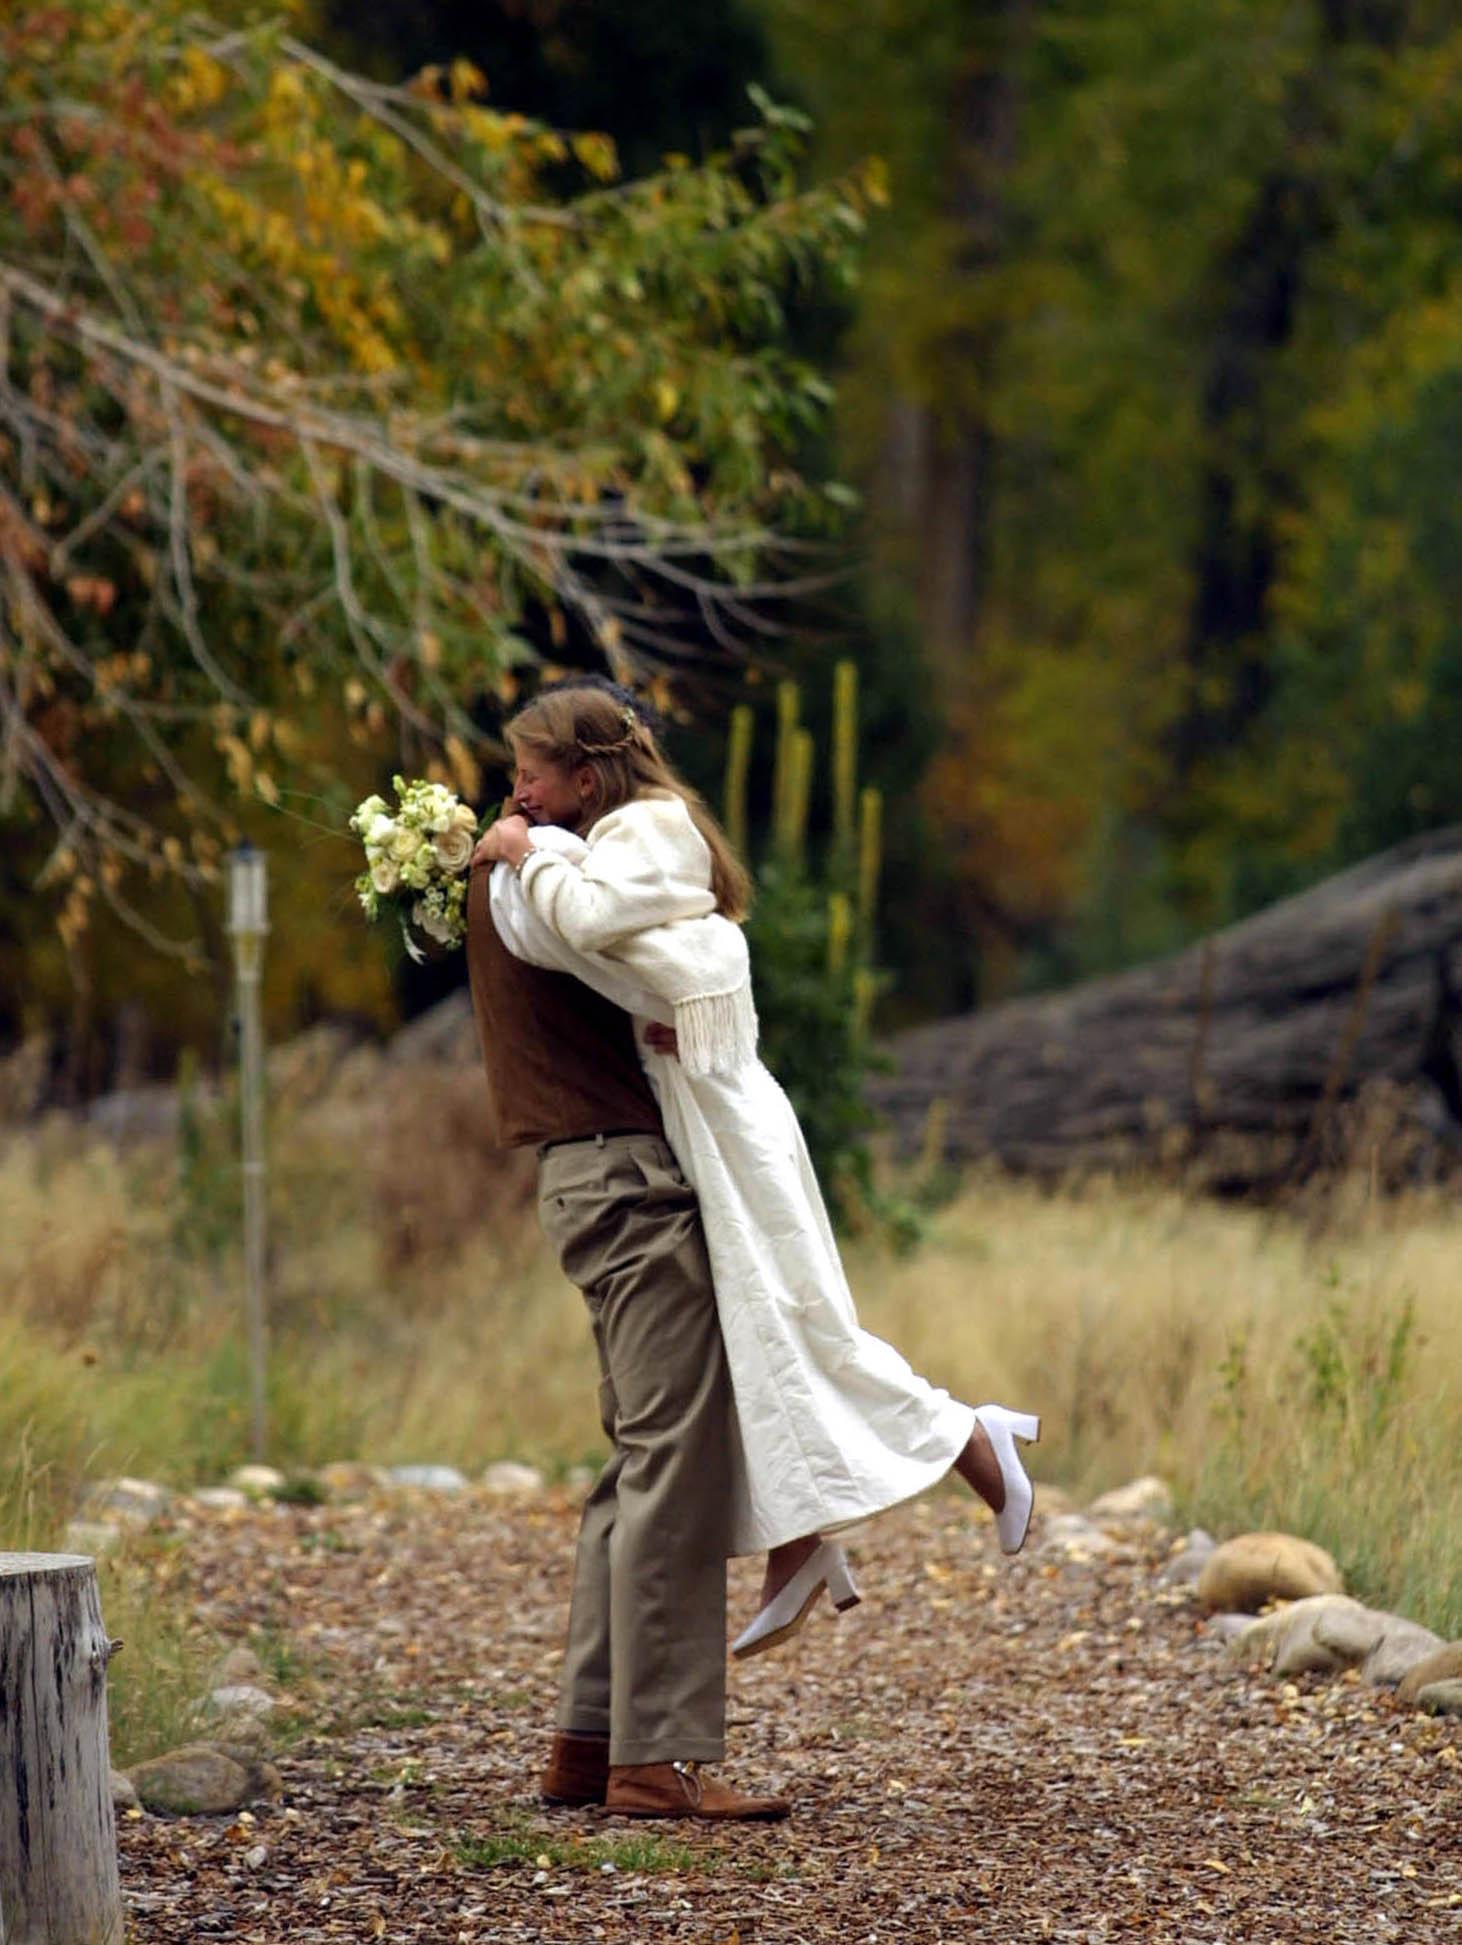 Ritz-Carlton-Bachelors-Gulch-wedding-photography-axelphoto.JPG.JPG